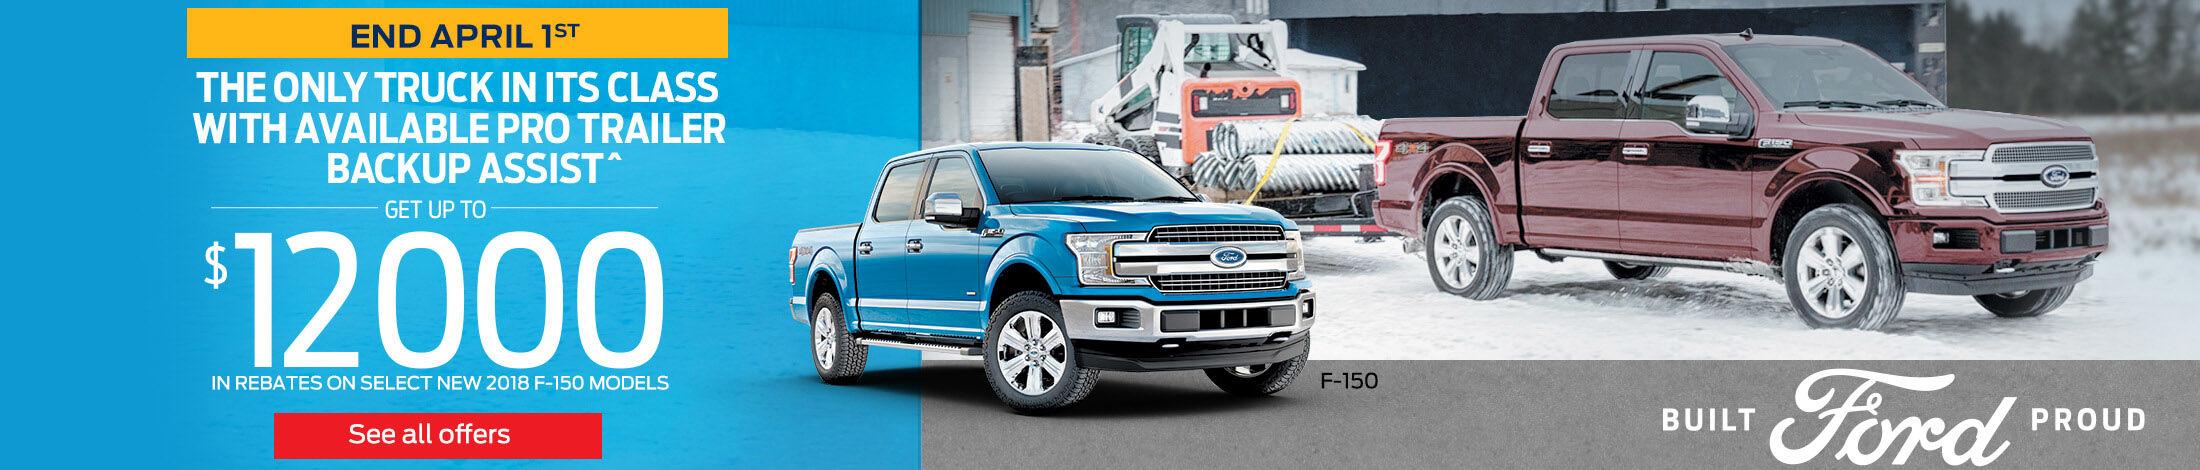 Ford Rebates on F-150 2018